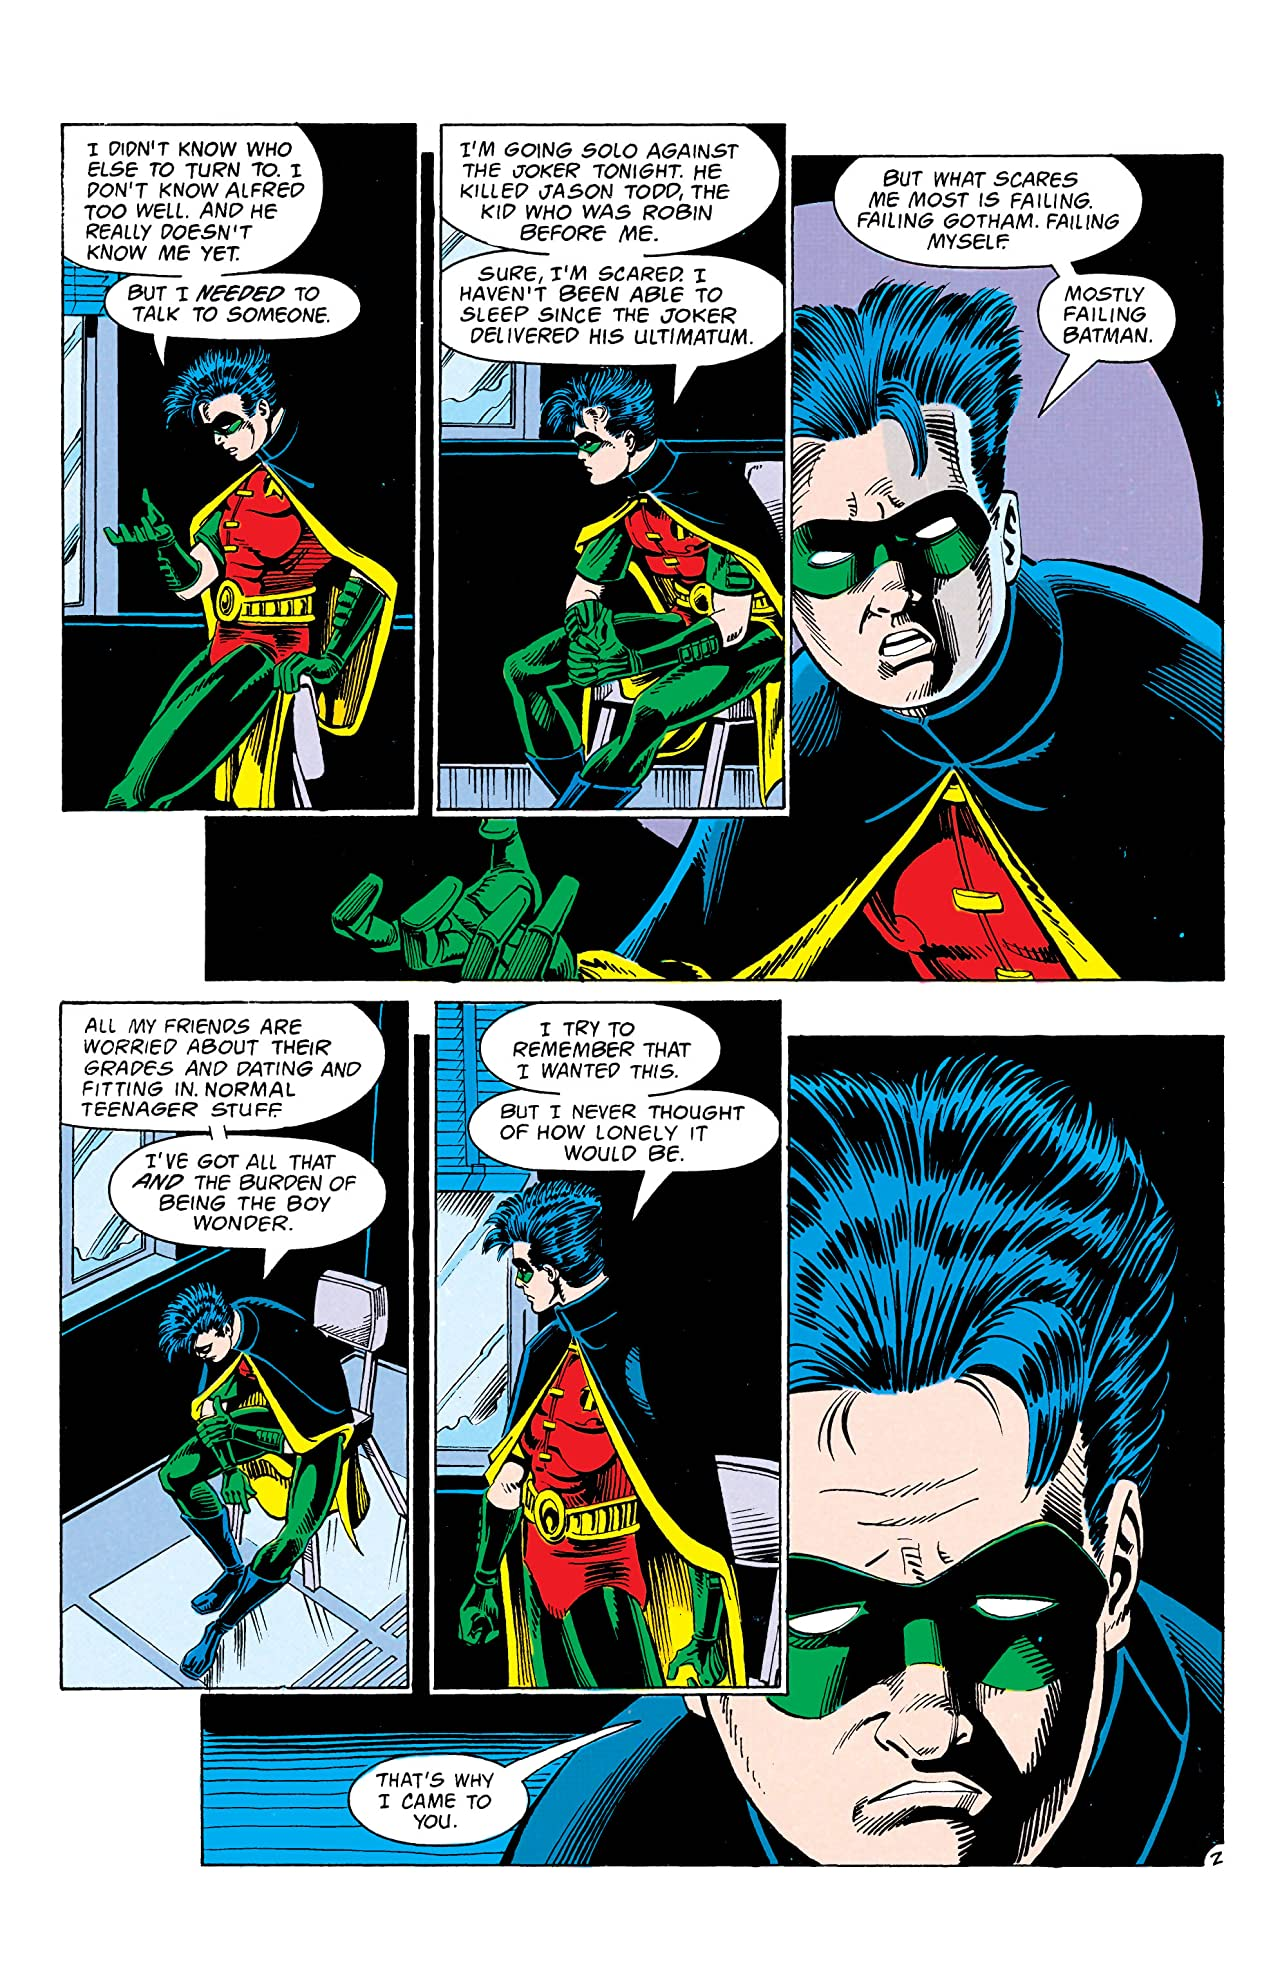 Robin II: Joker's Wild (1991) #4